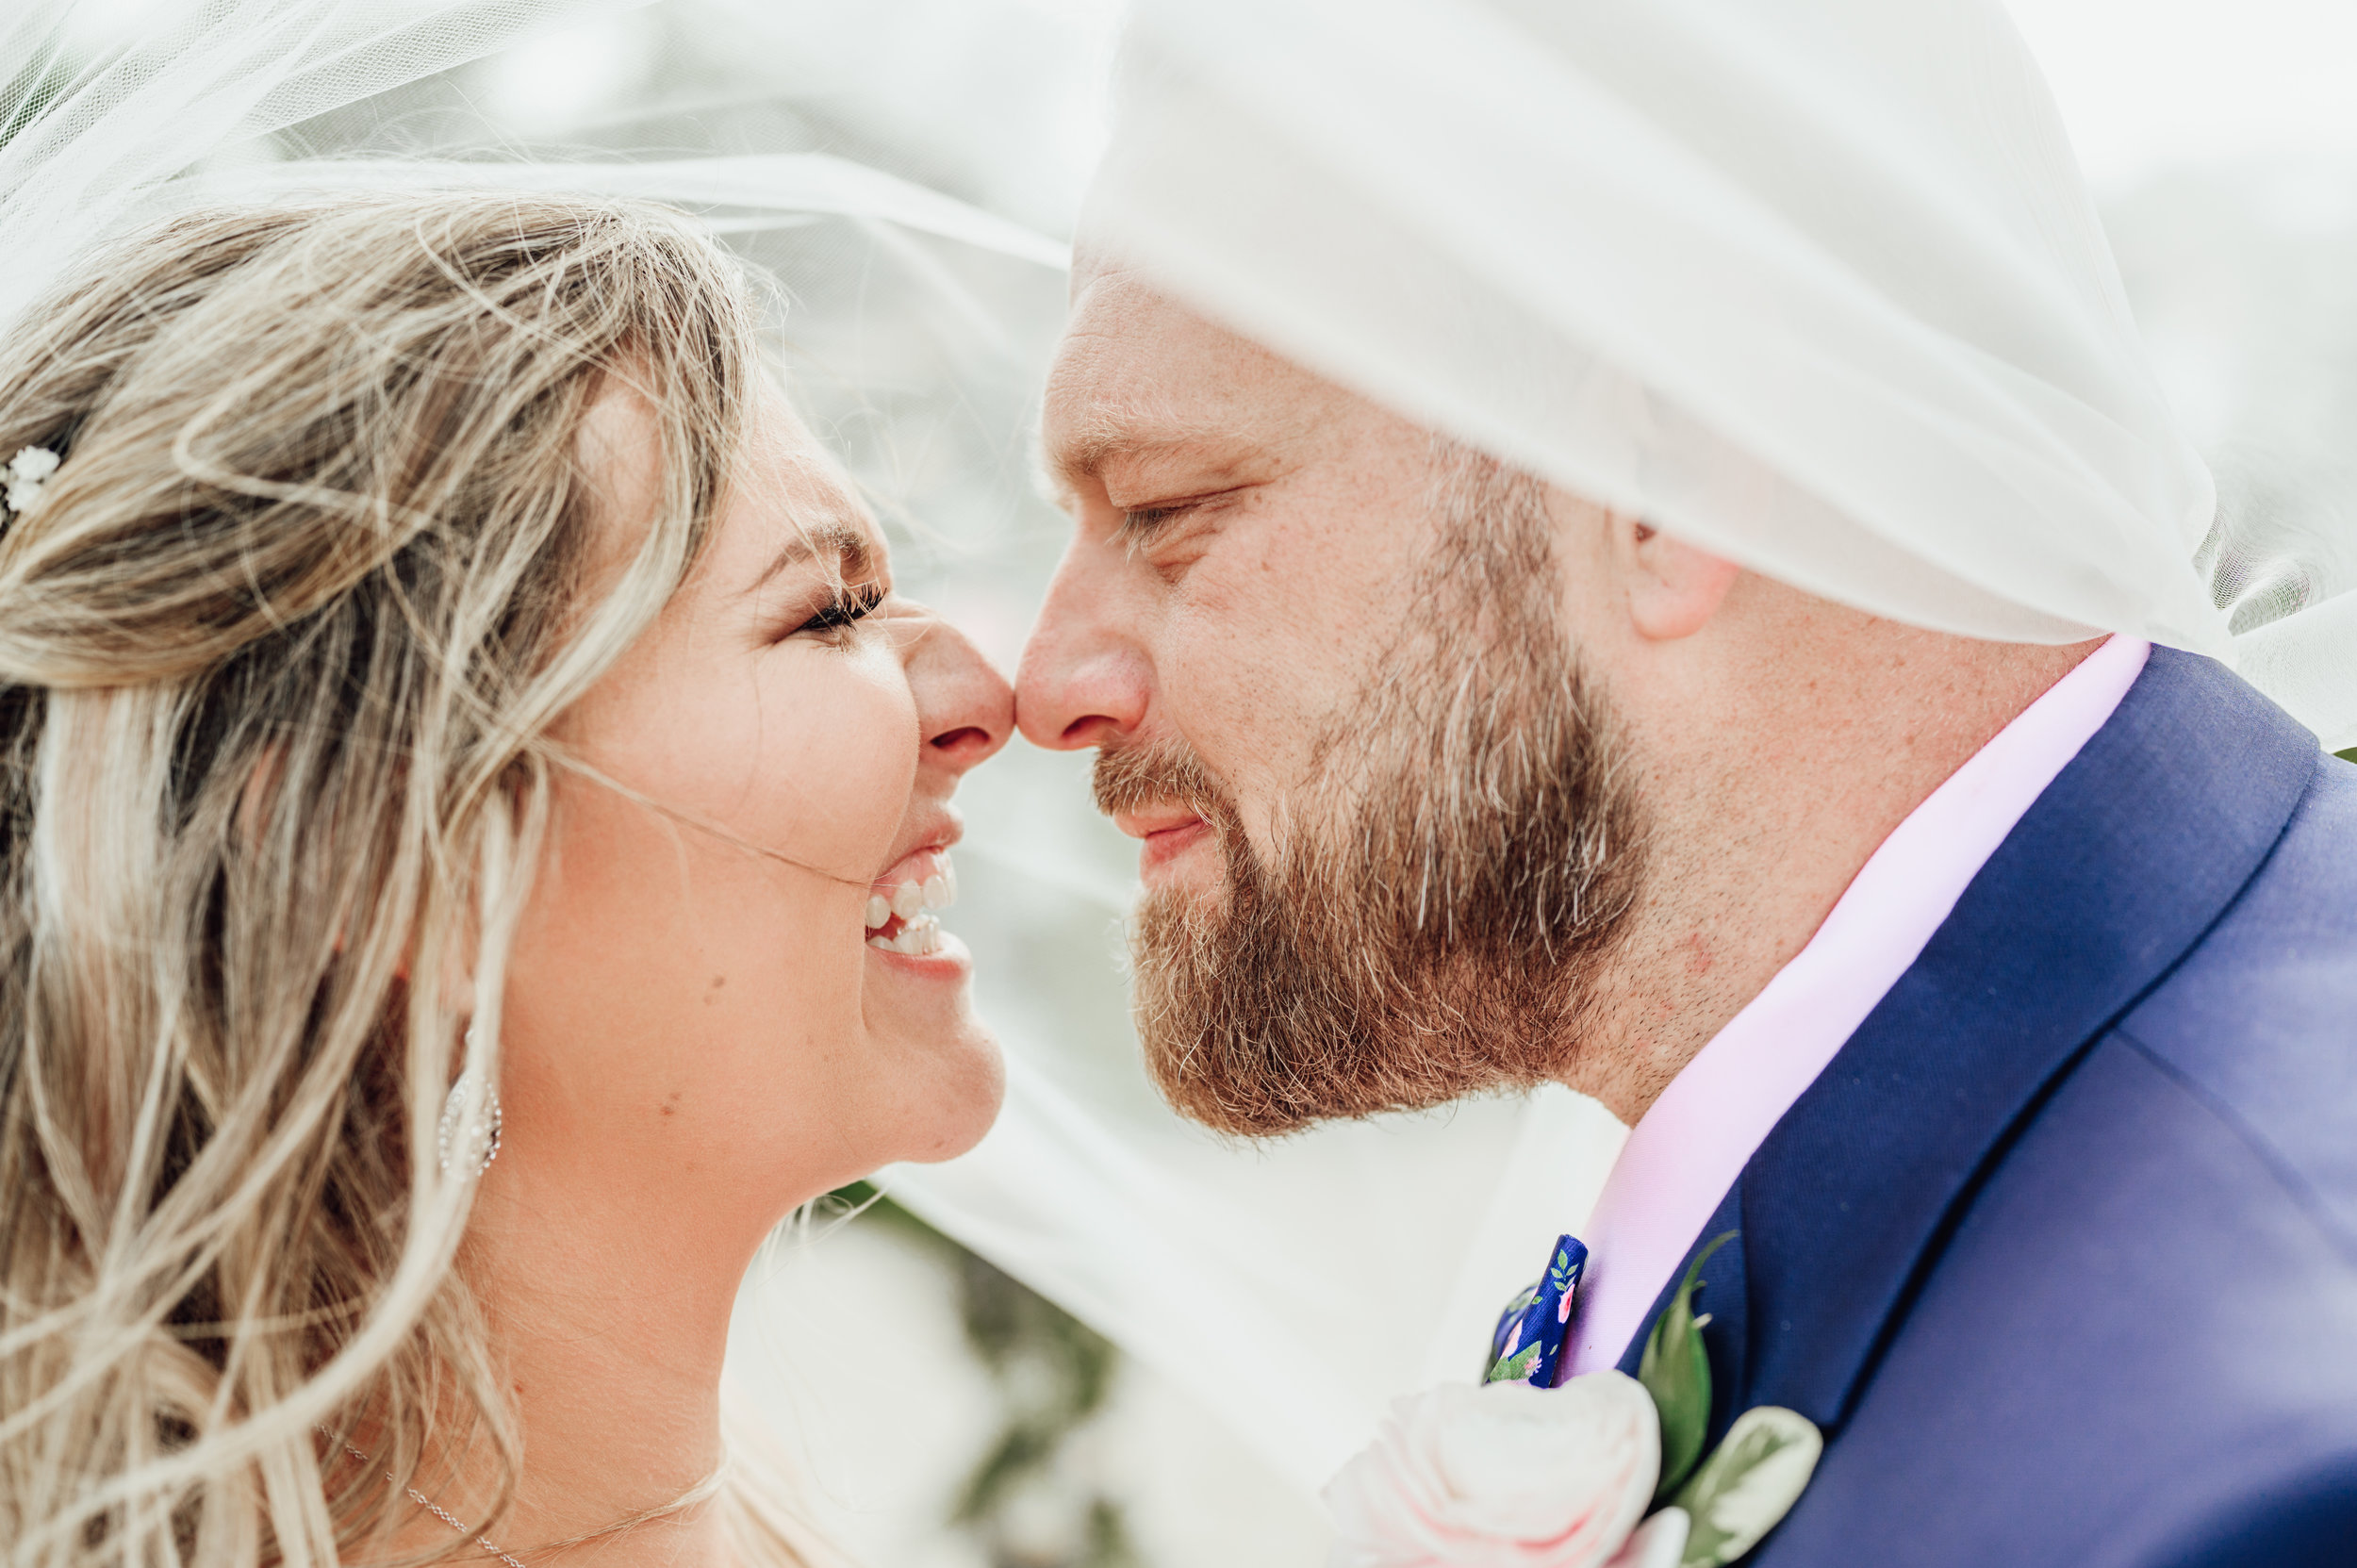 New Jersey Wedding Photographer, Felsberg Photography LBI wedding photography 85.jpg